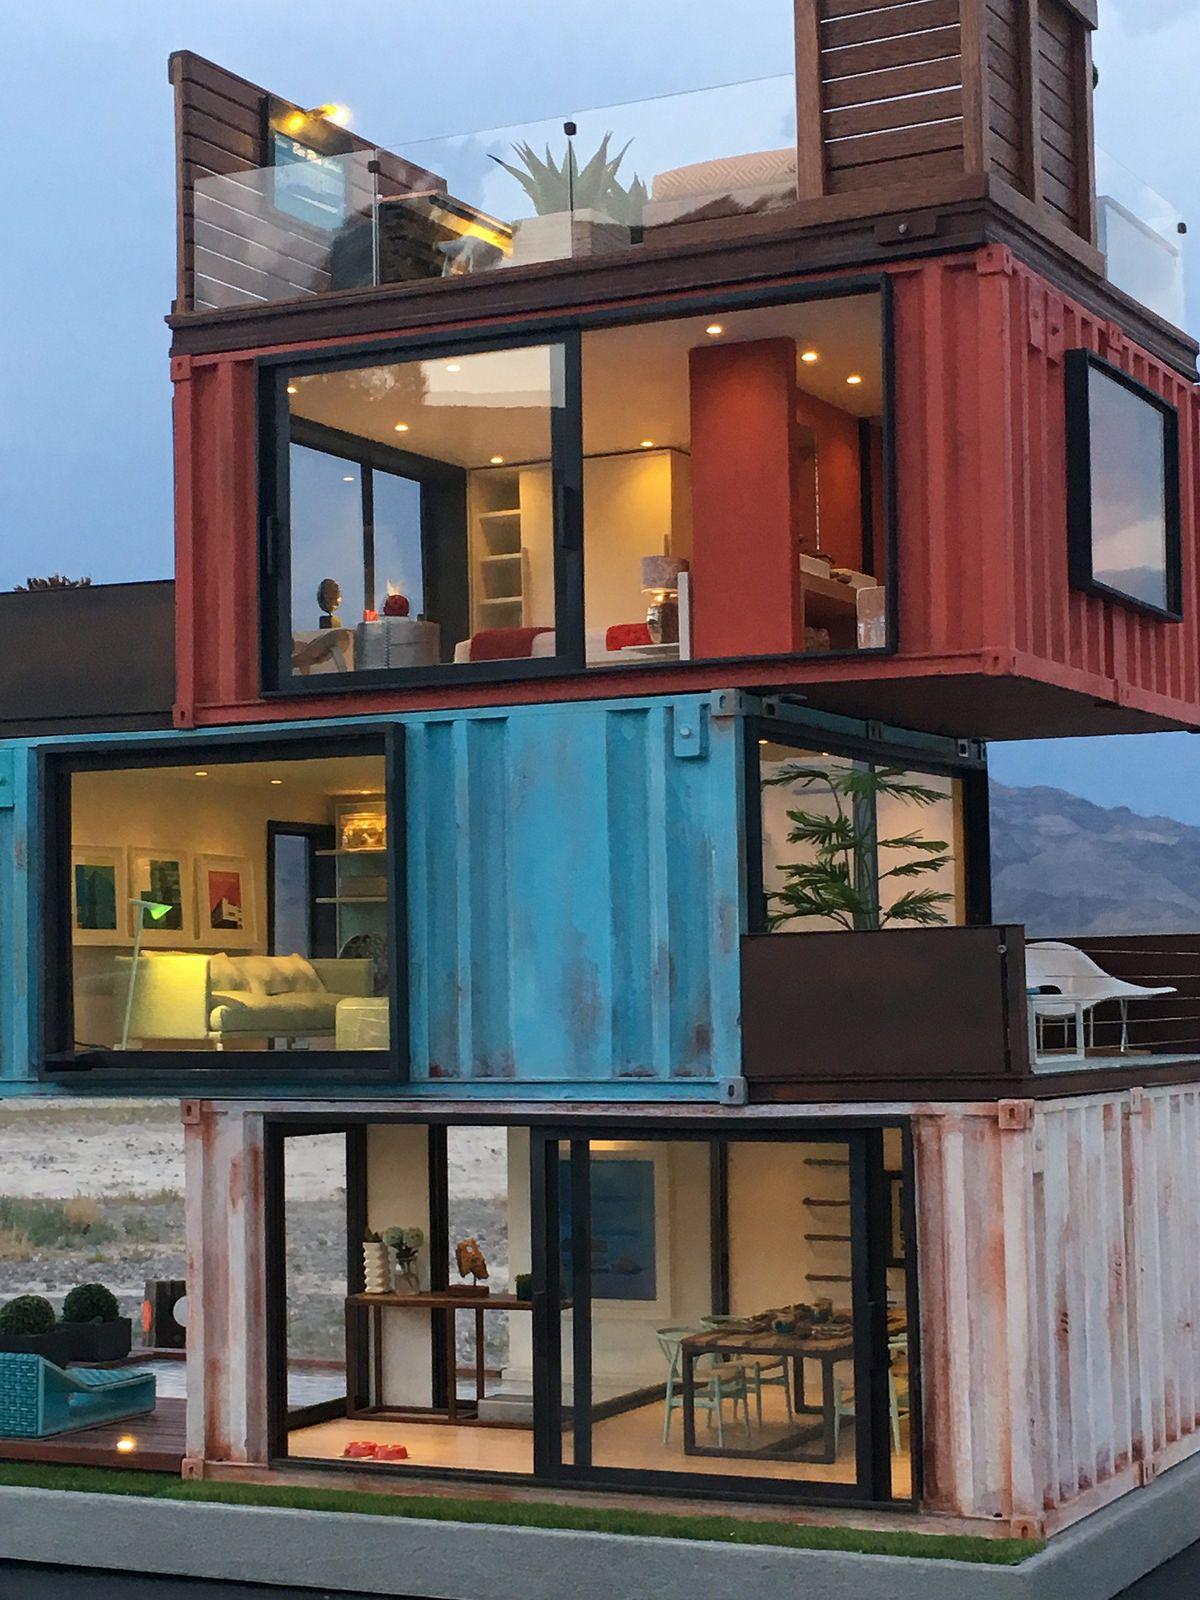 Casa de madrid a residence case study of cargotecture in - Arquitectura contenedores maritimos ...